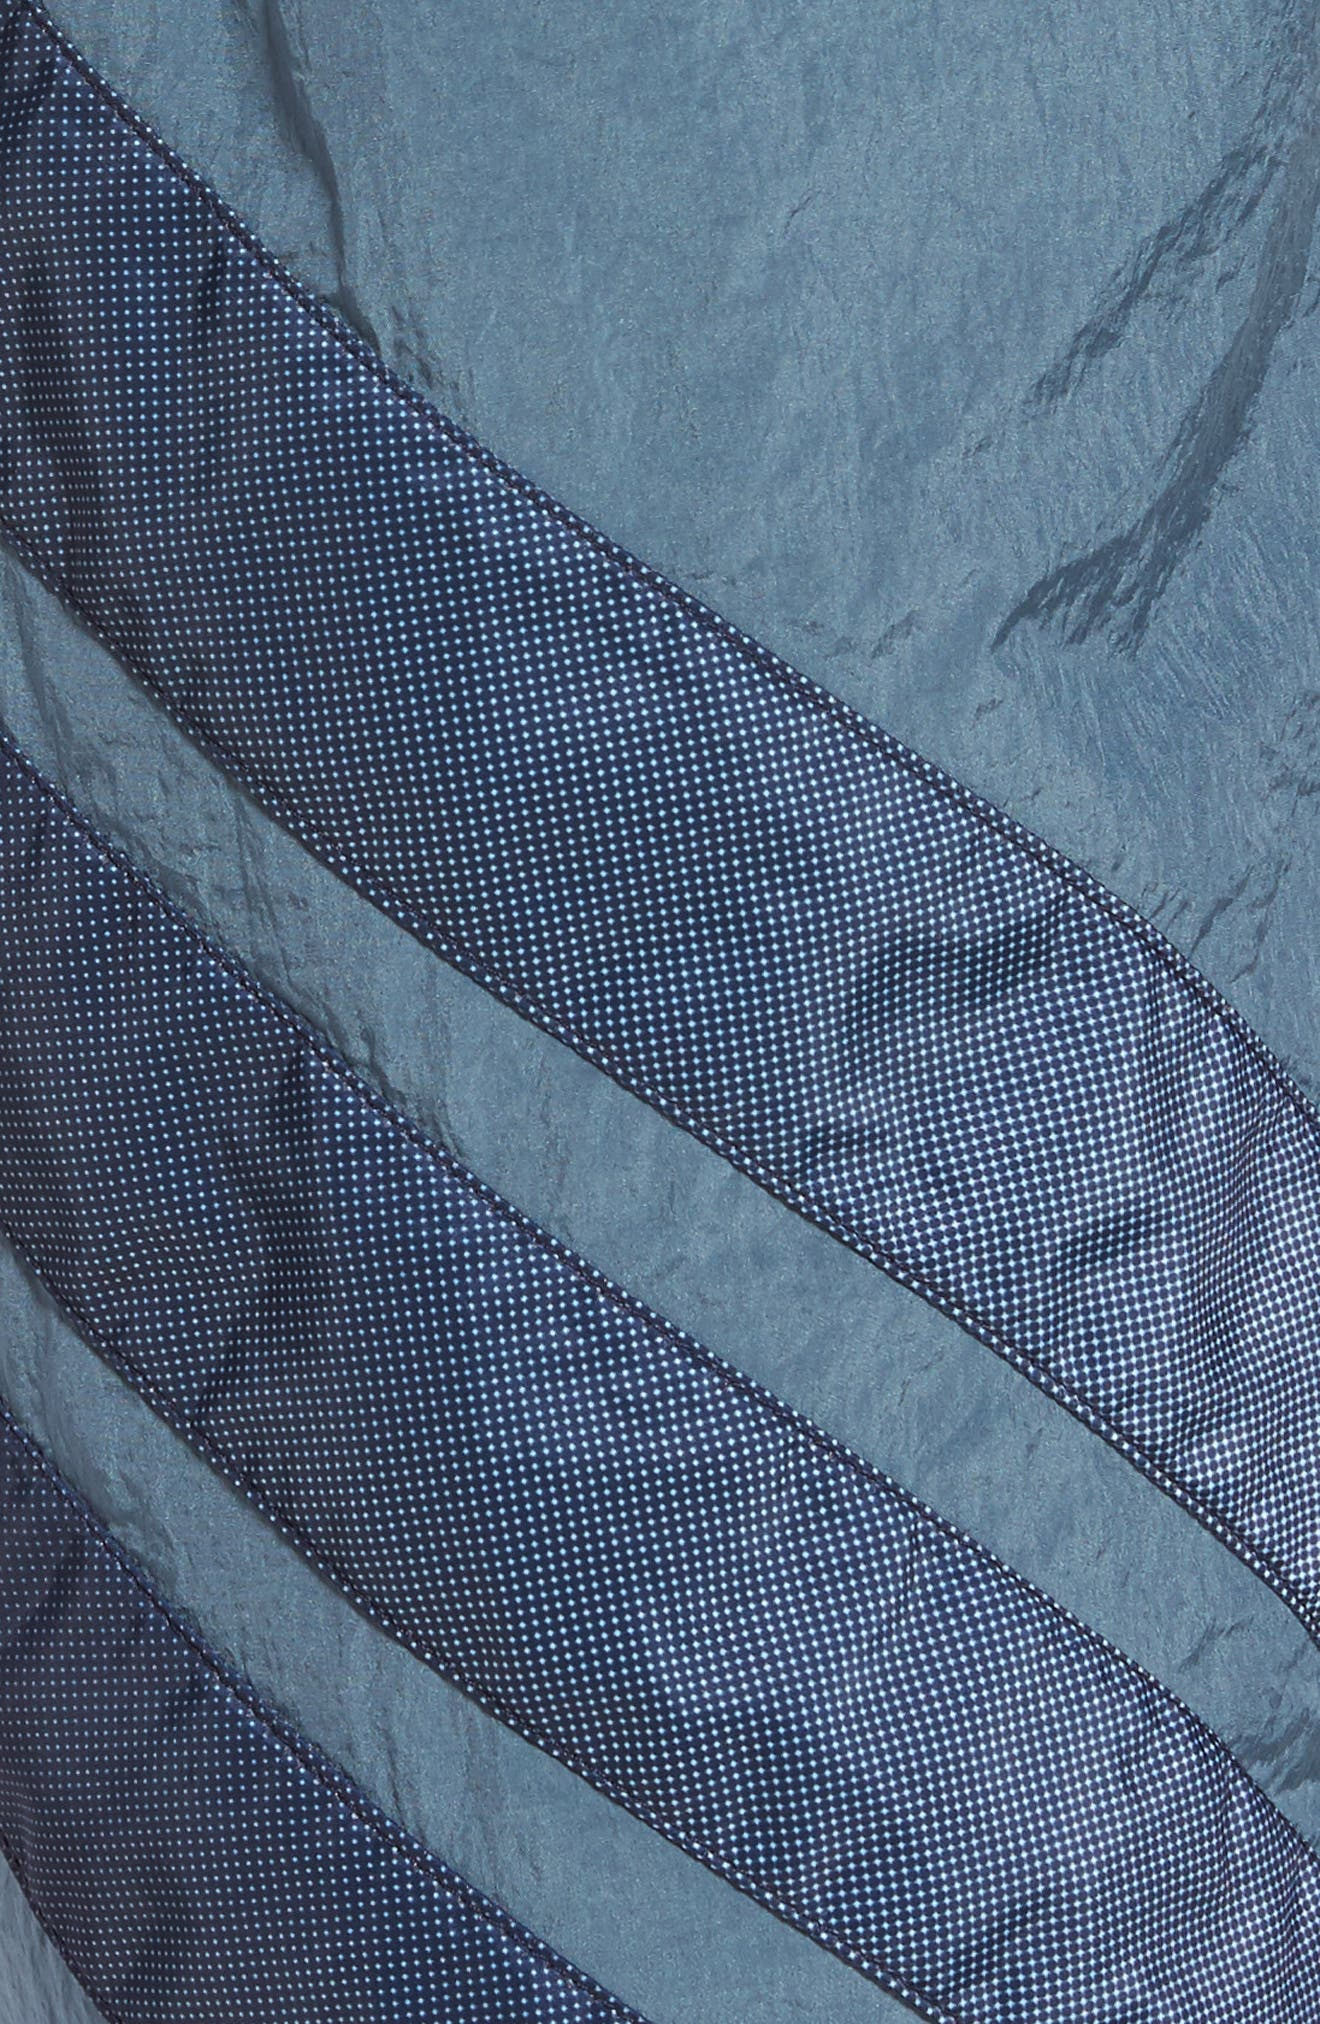 Originals V-Stripe Windpants,                             Alternate thumbnail 5, color,                             Raw Steel/ White